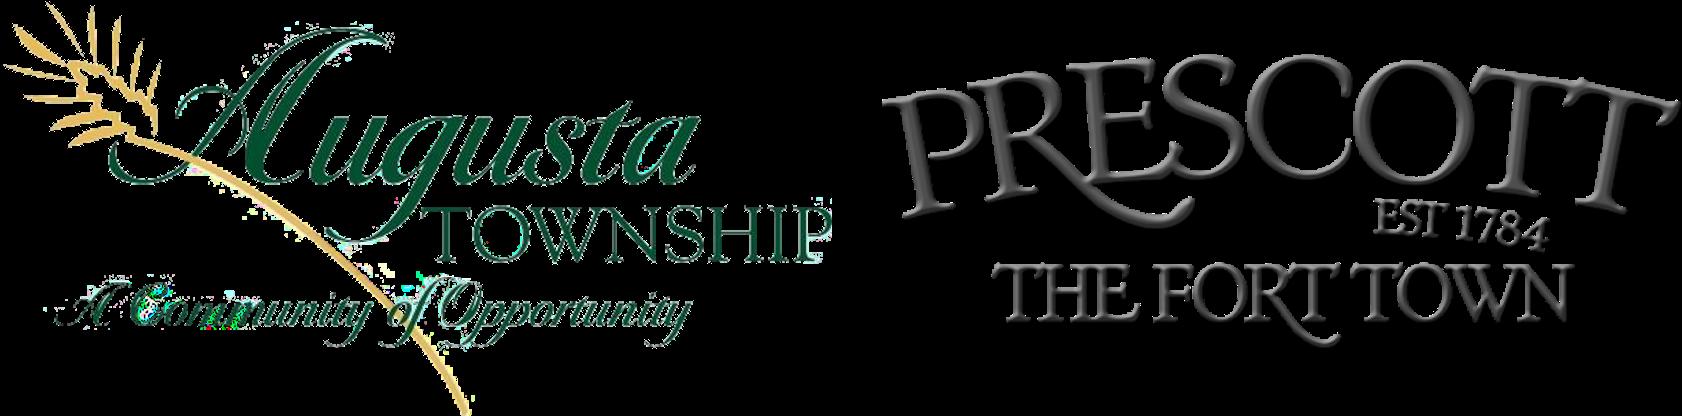 augusta logo & prescott logo